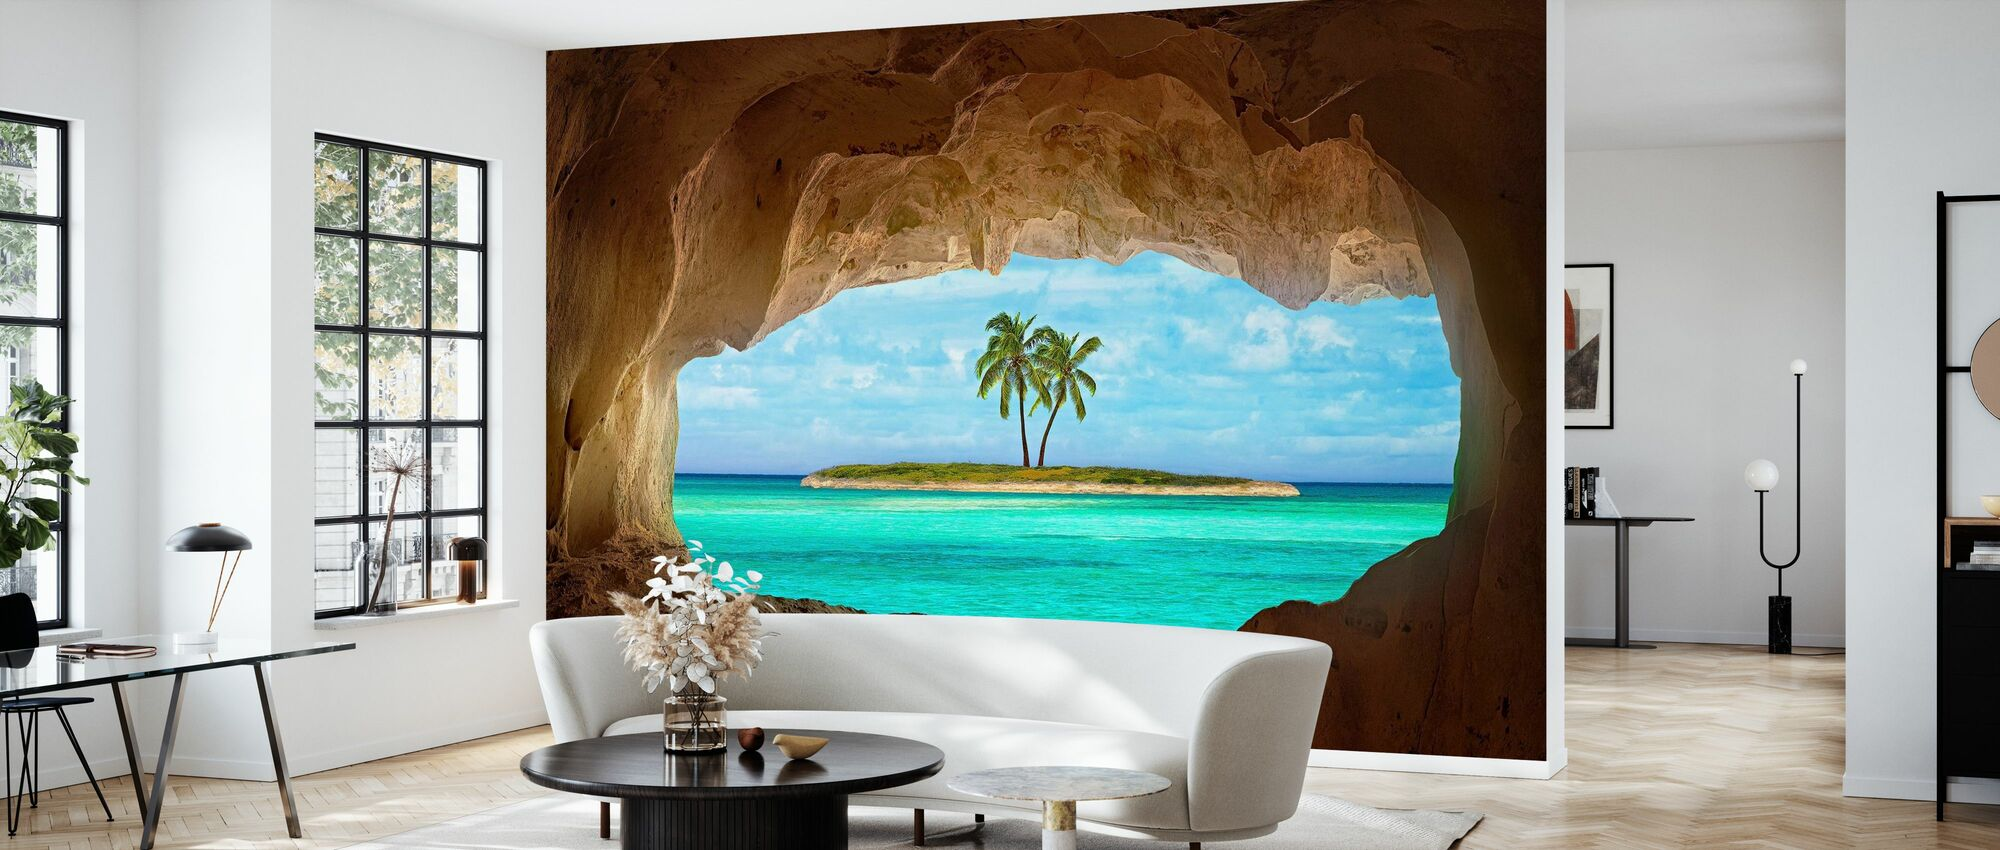 Paradise through Window - Wallpaper - Living Room